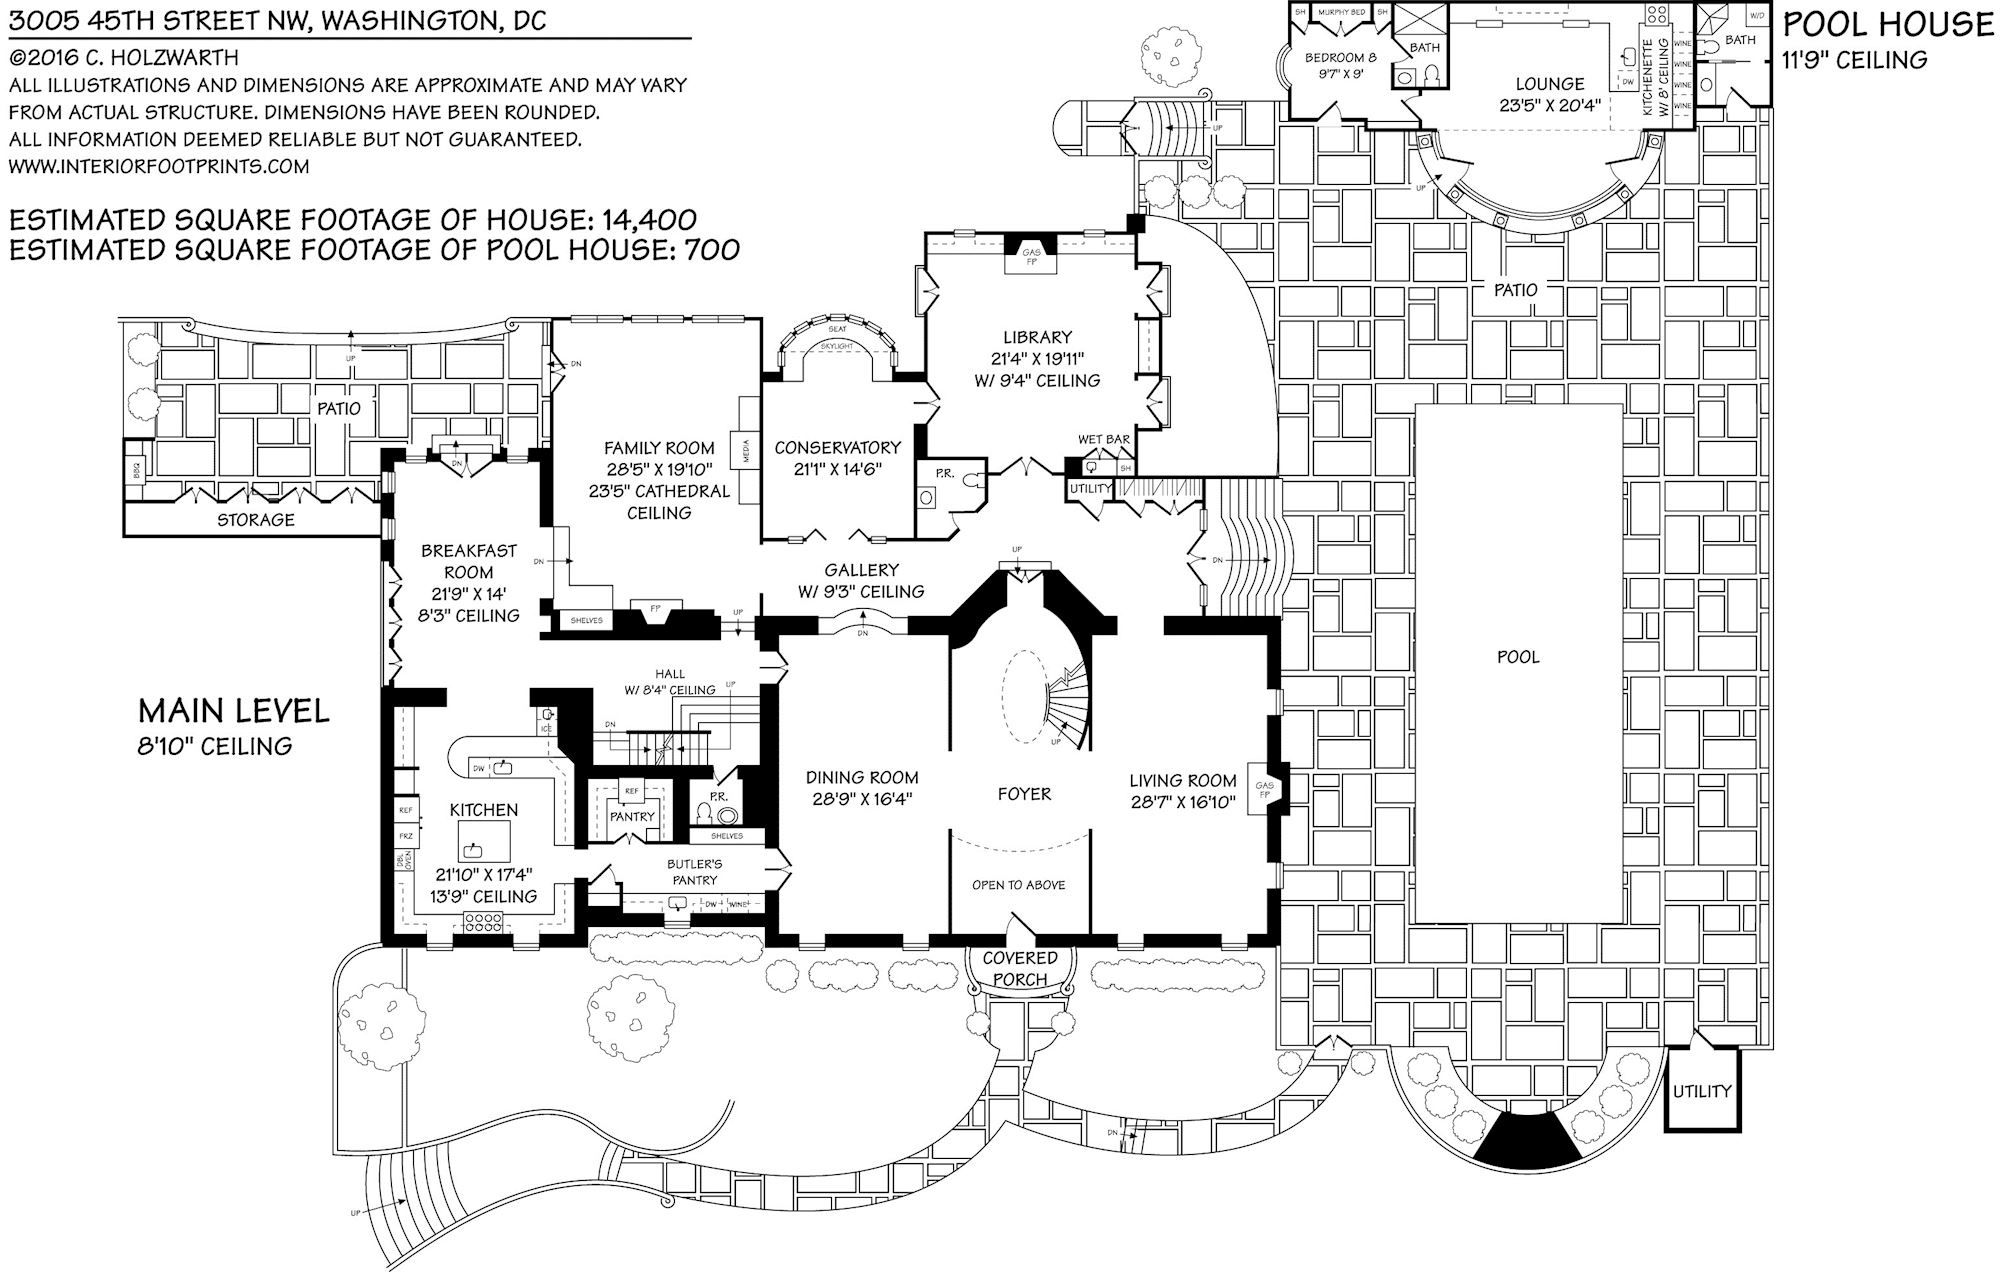 15 000 Square Foot Washington Dc Home Main Level Floor Plan 3005 45th St Nw Floor Plans House Floor Plans House Heating